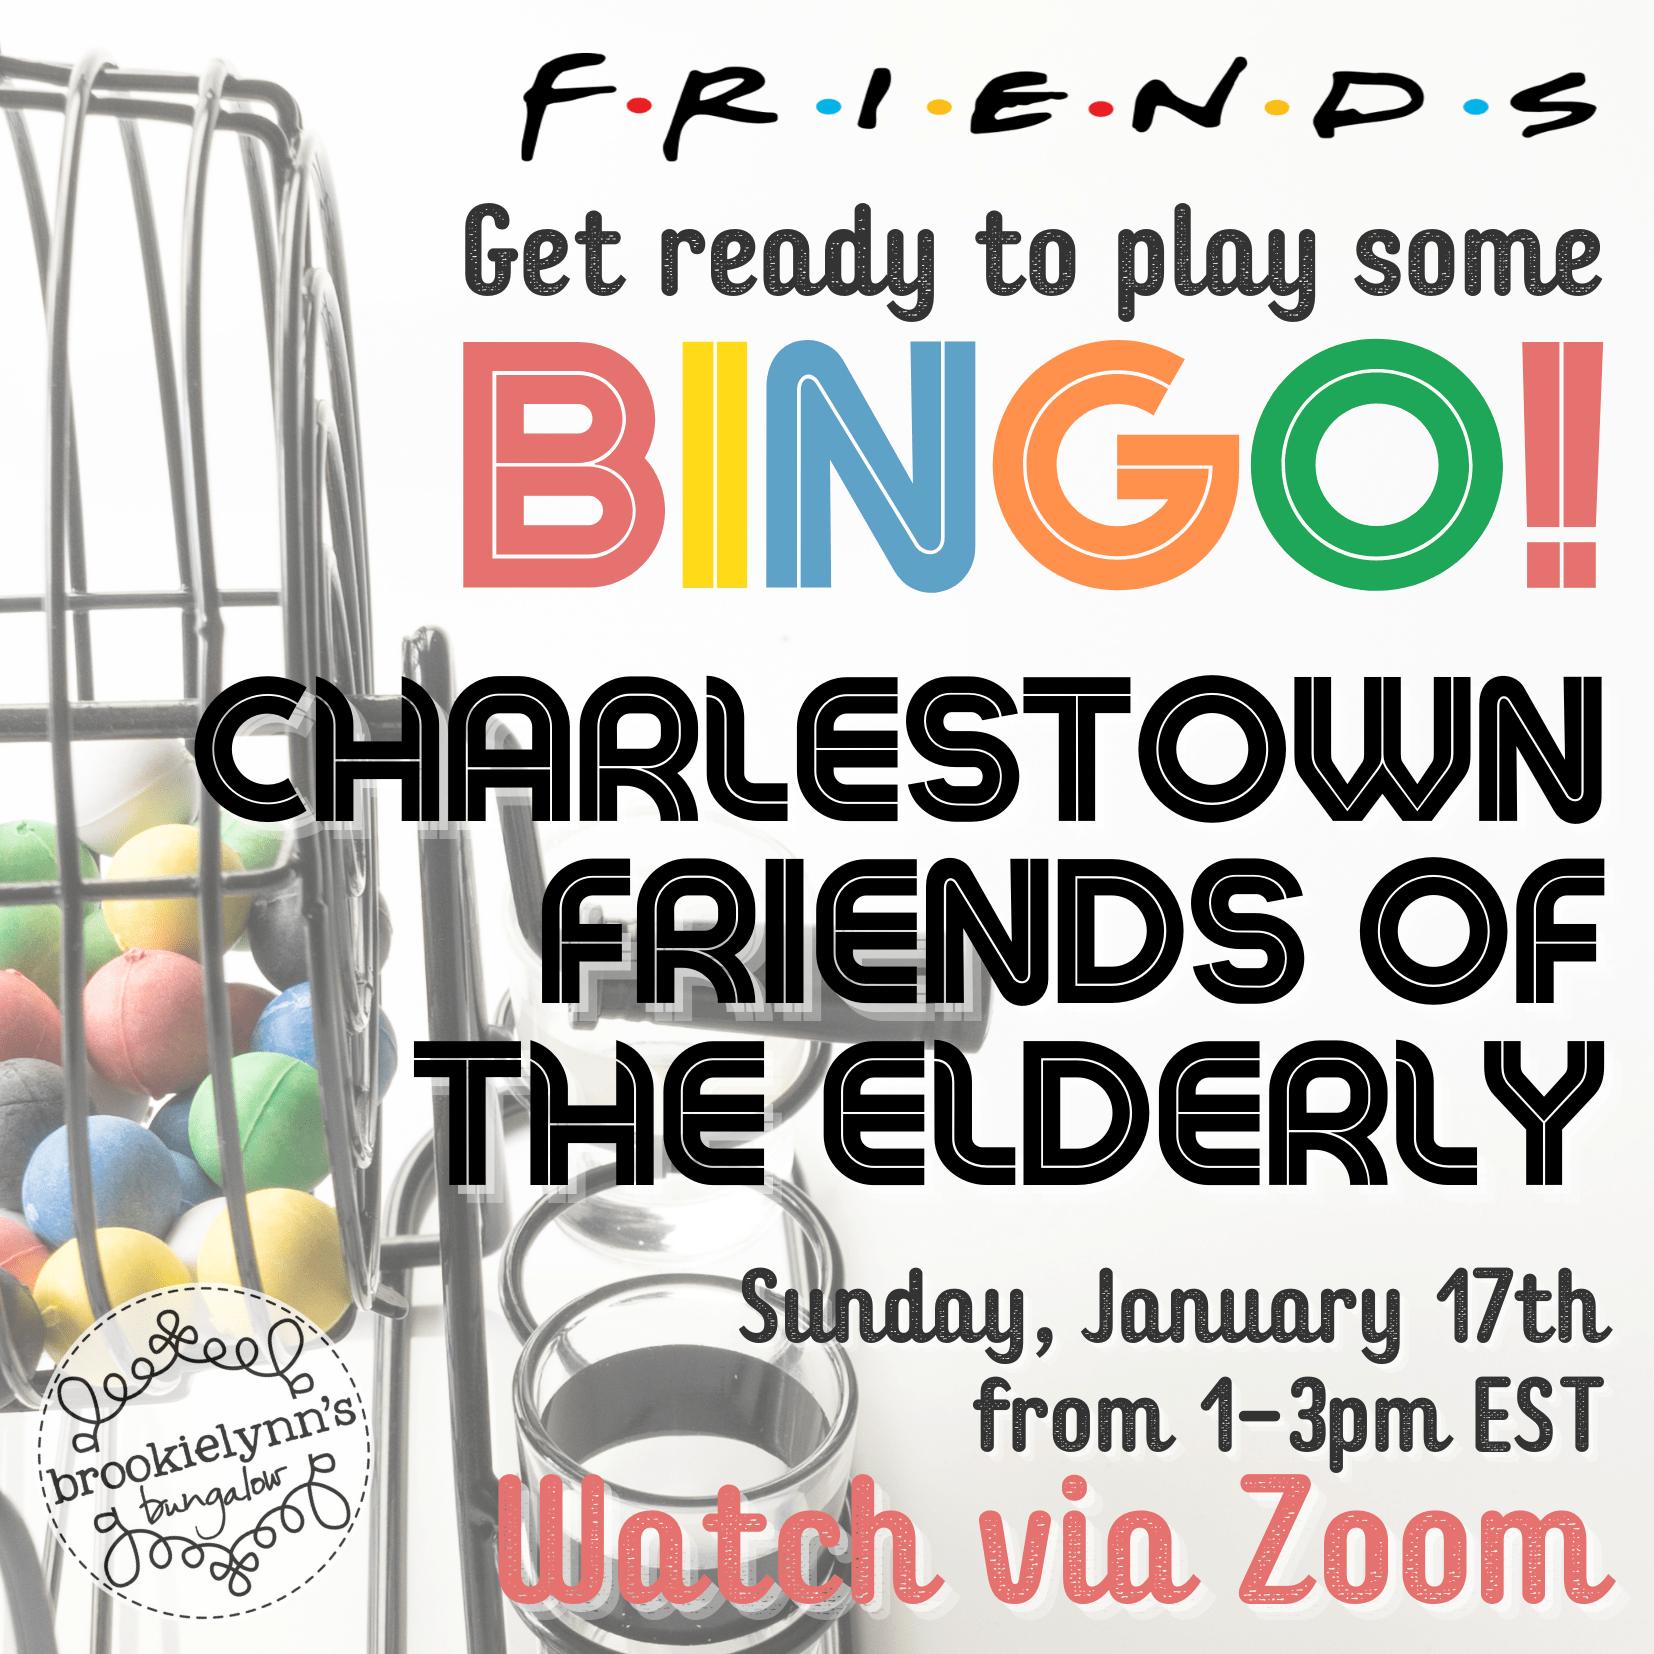 Virtual Bingo Fundraiser Benefiting Charlestown Friends of the Elderly